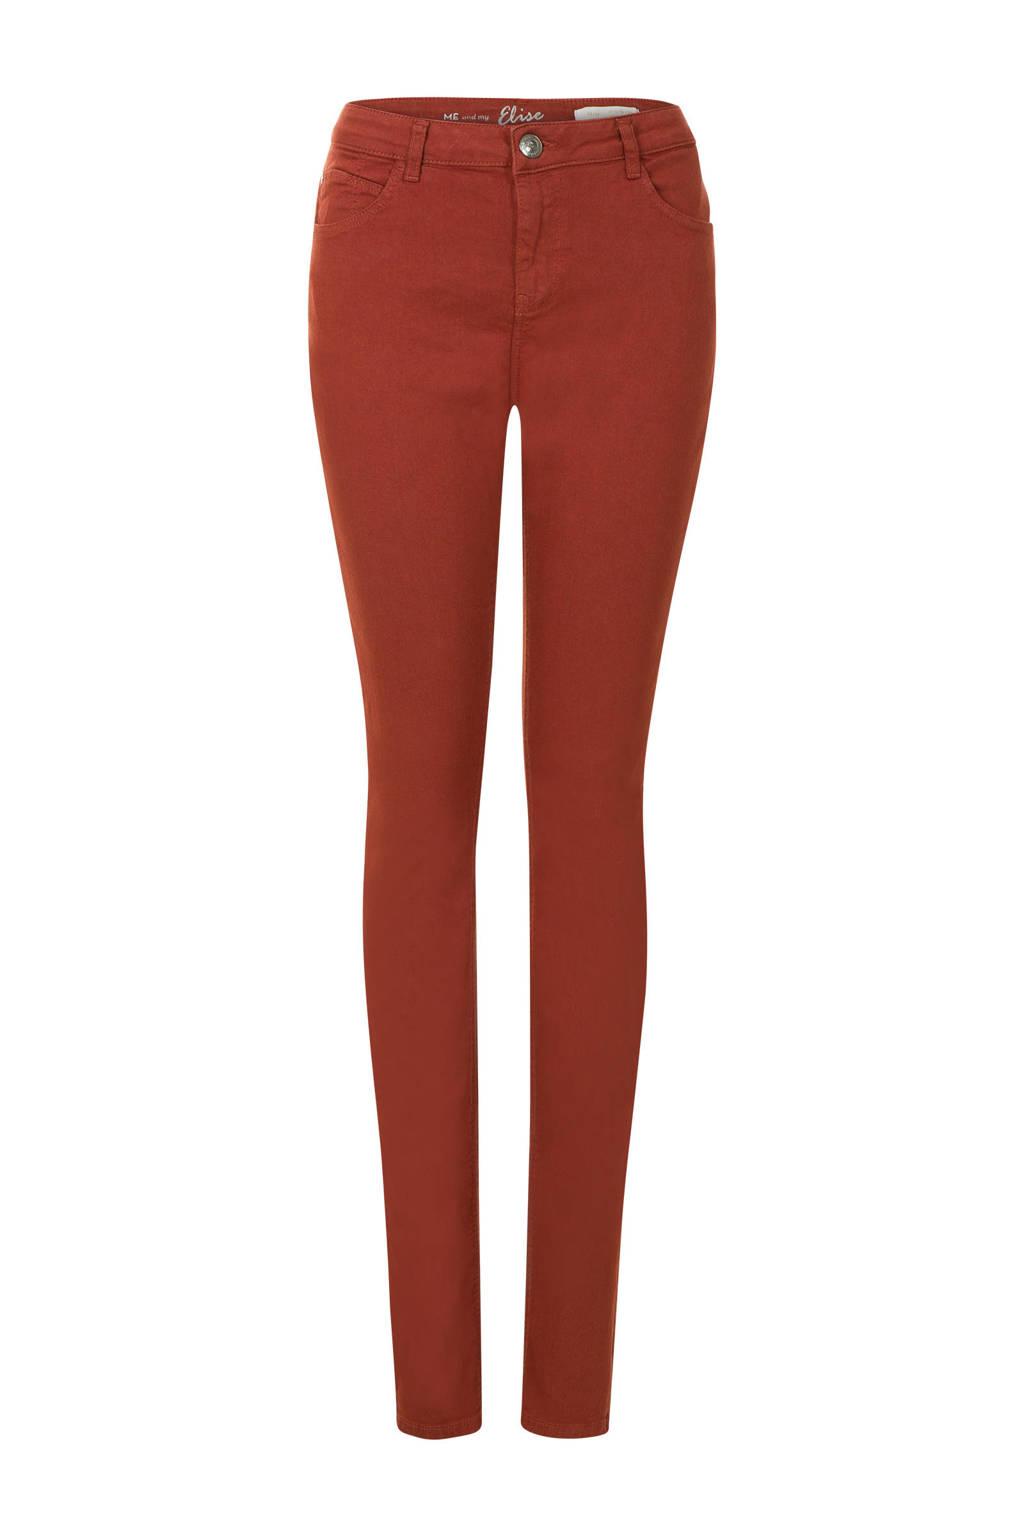 Miss Etam Lang slim fit jeans rood, Rood